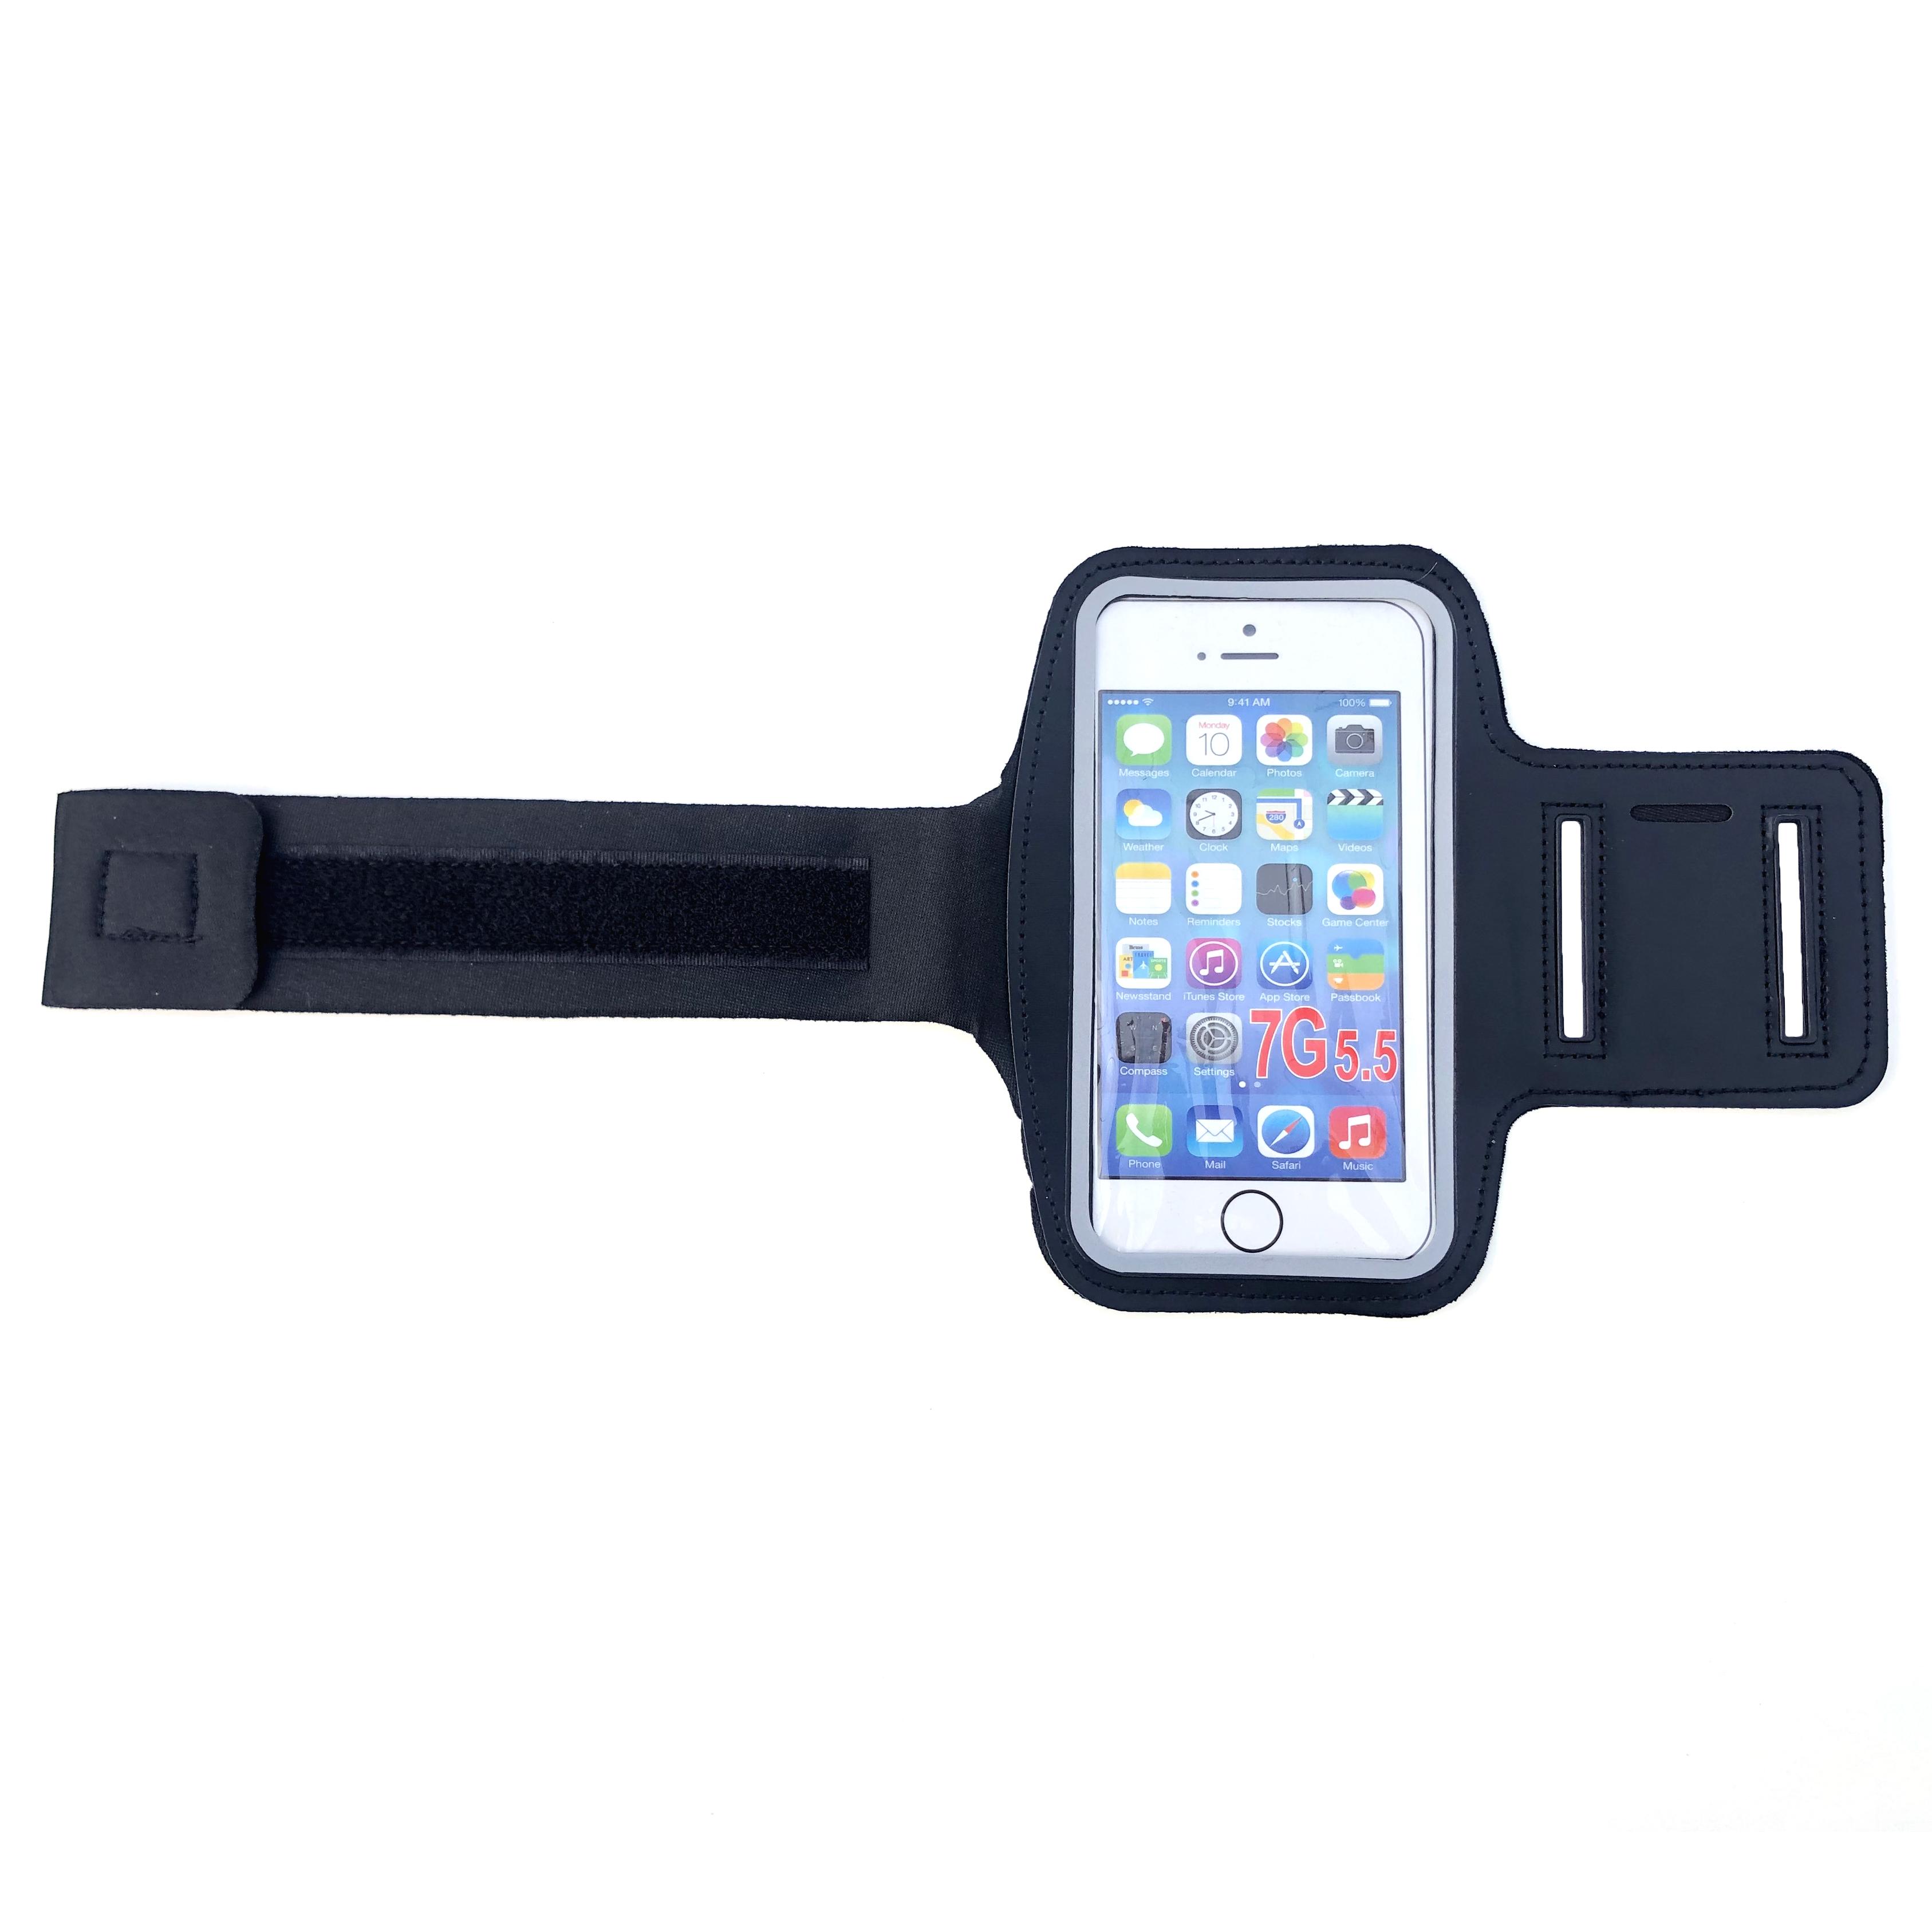 Спортивный чехол на руку для телефона Bordo 5.5 AS 02